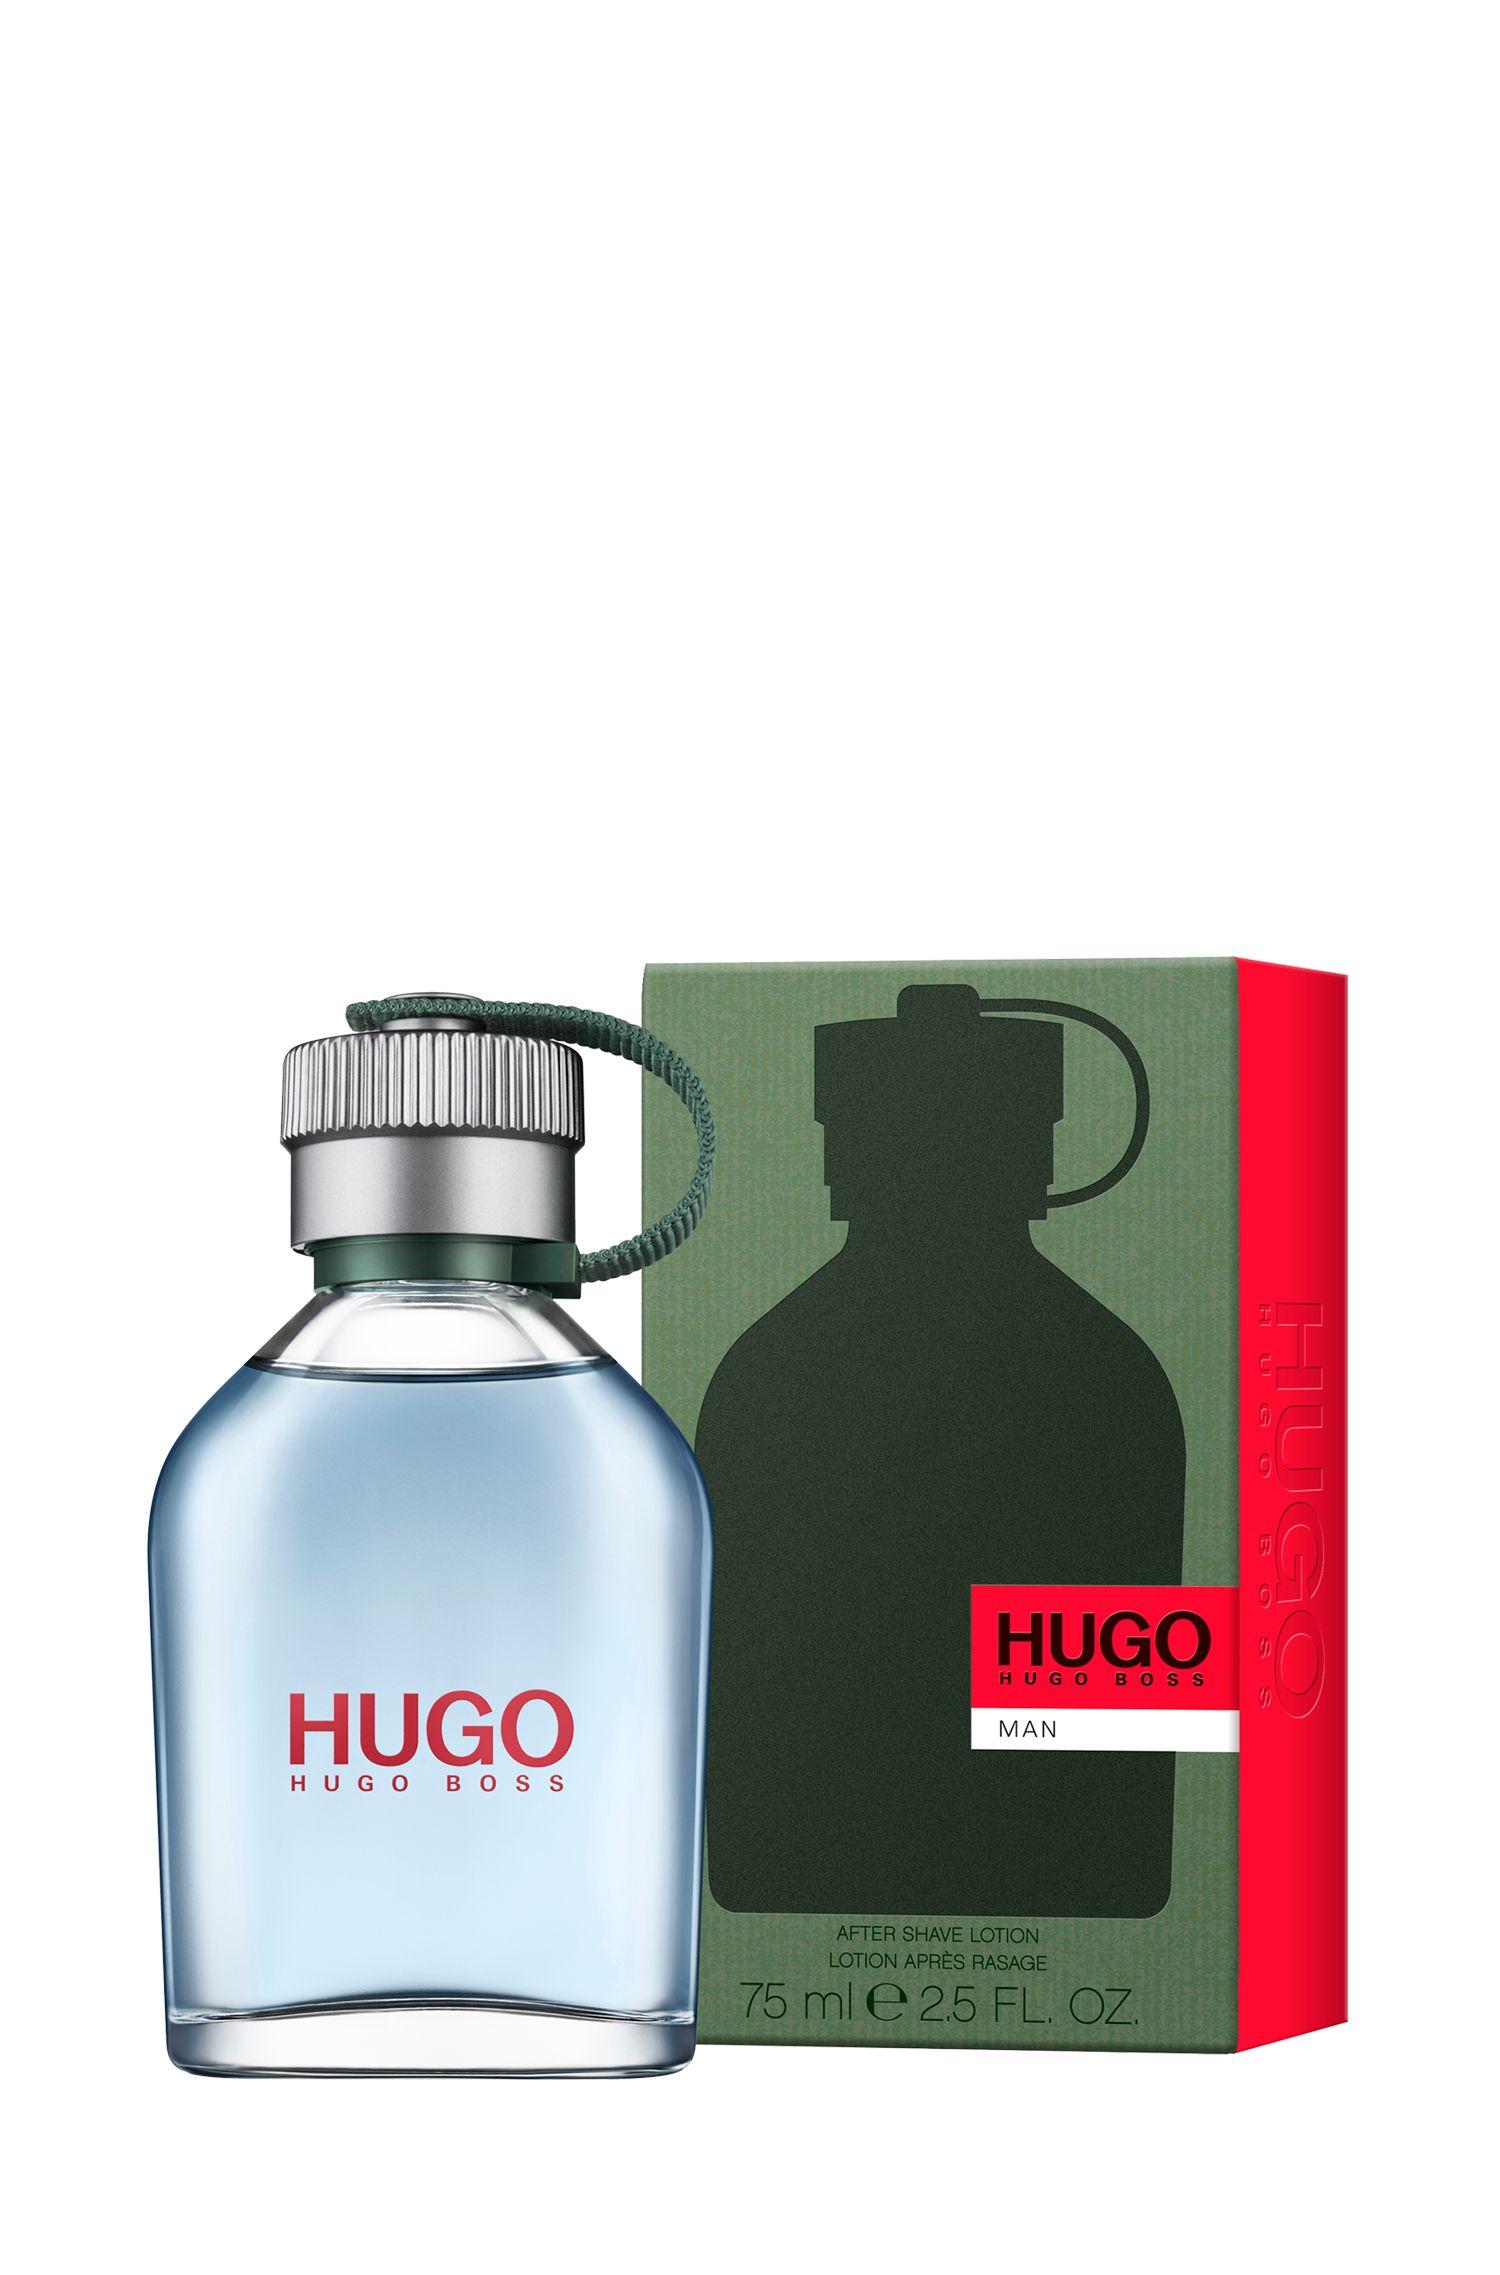 Lotion après-rasage HUGO Man 75ml